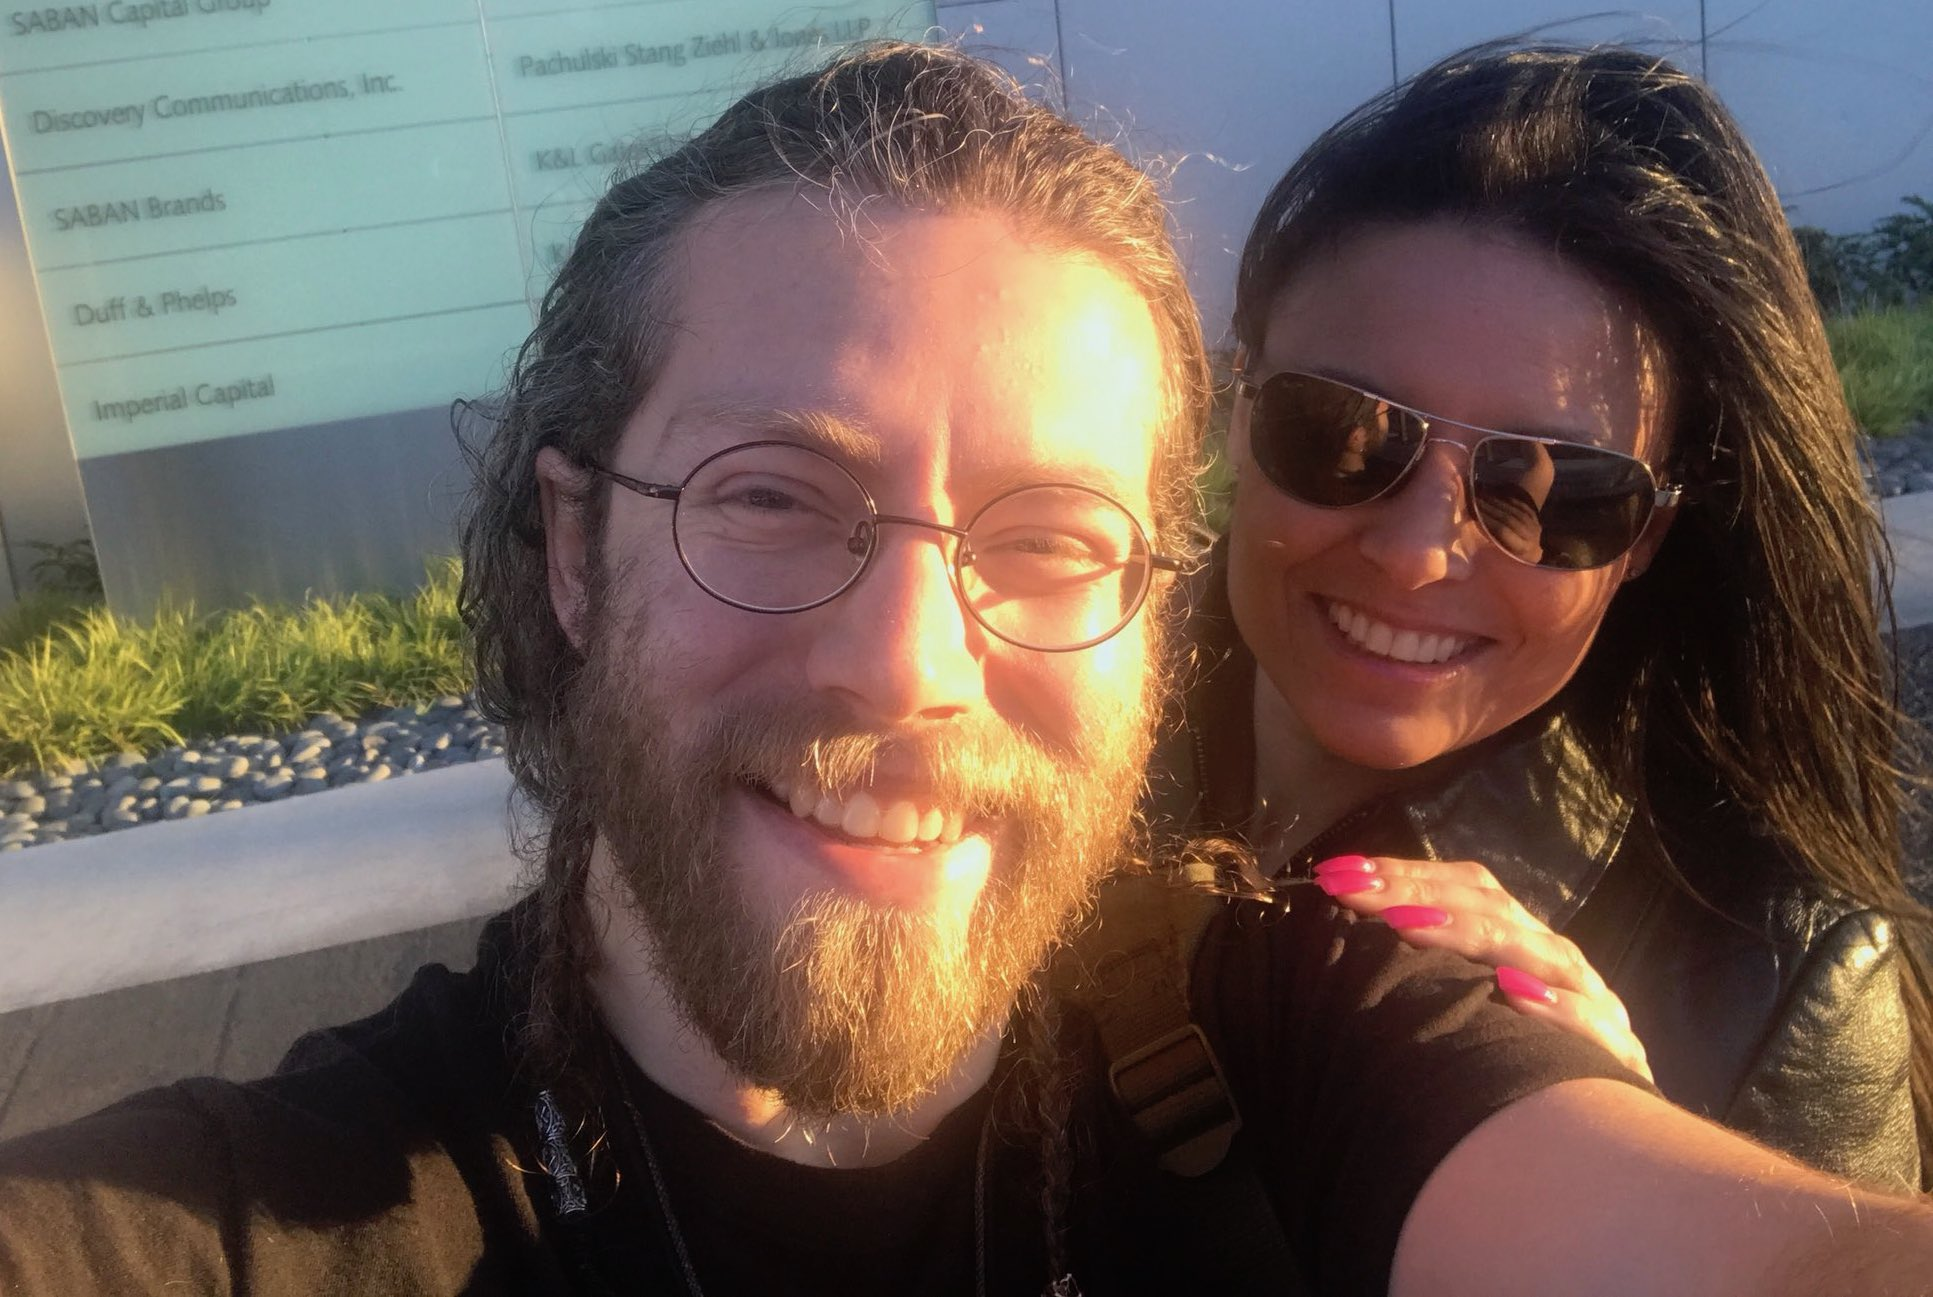 Allison Kagan: Details on Girlfriend of Alaskan Bush People Star Bam